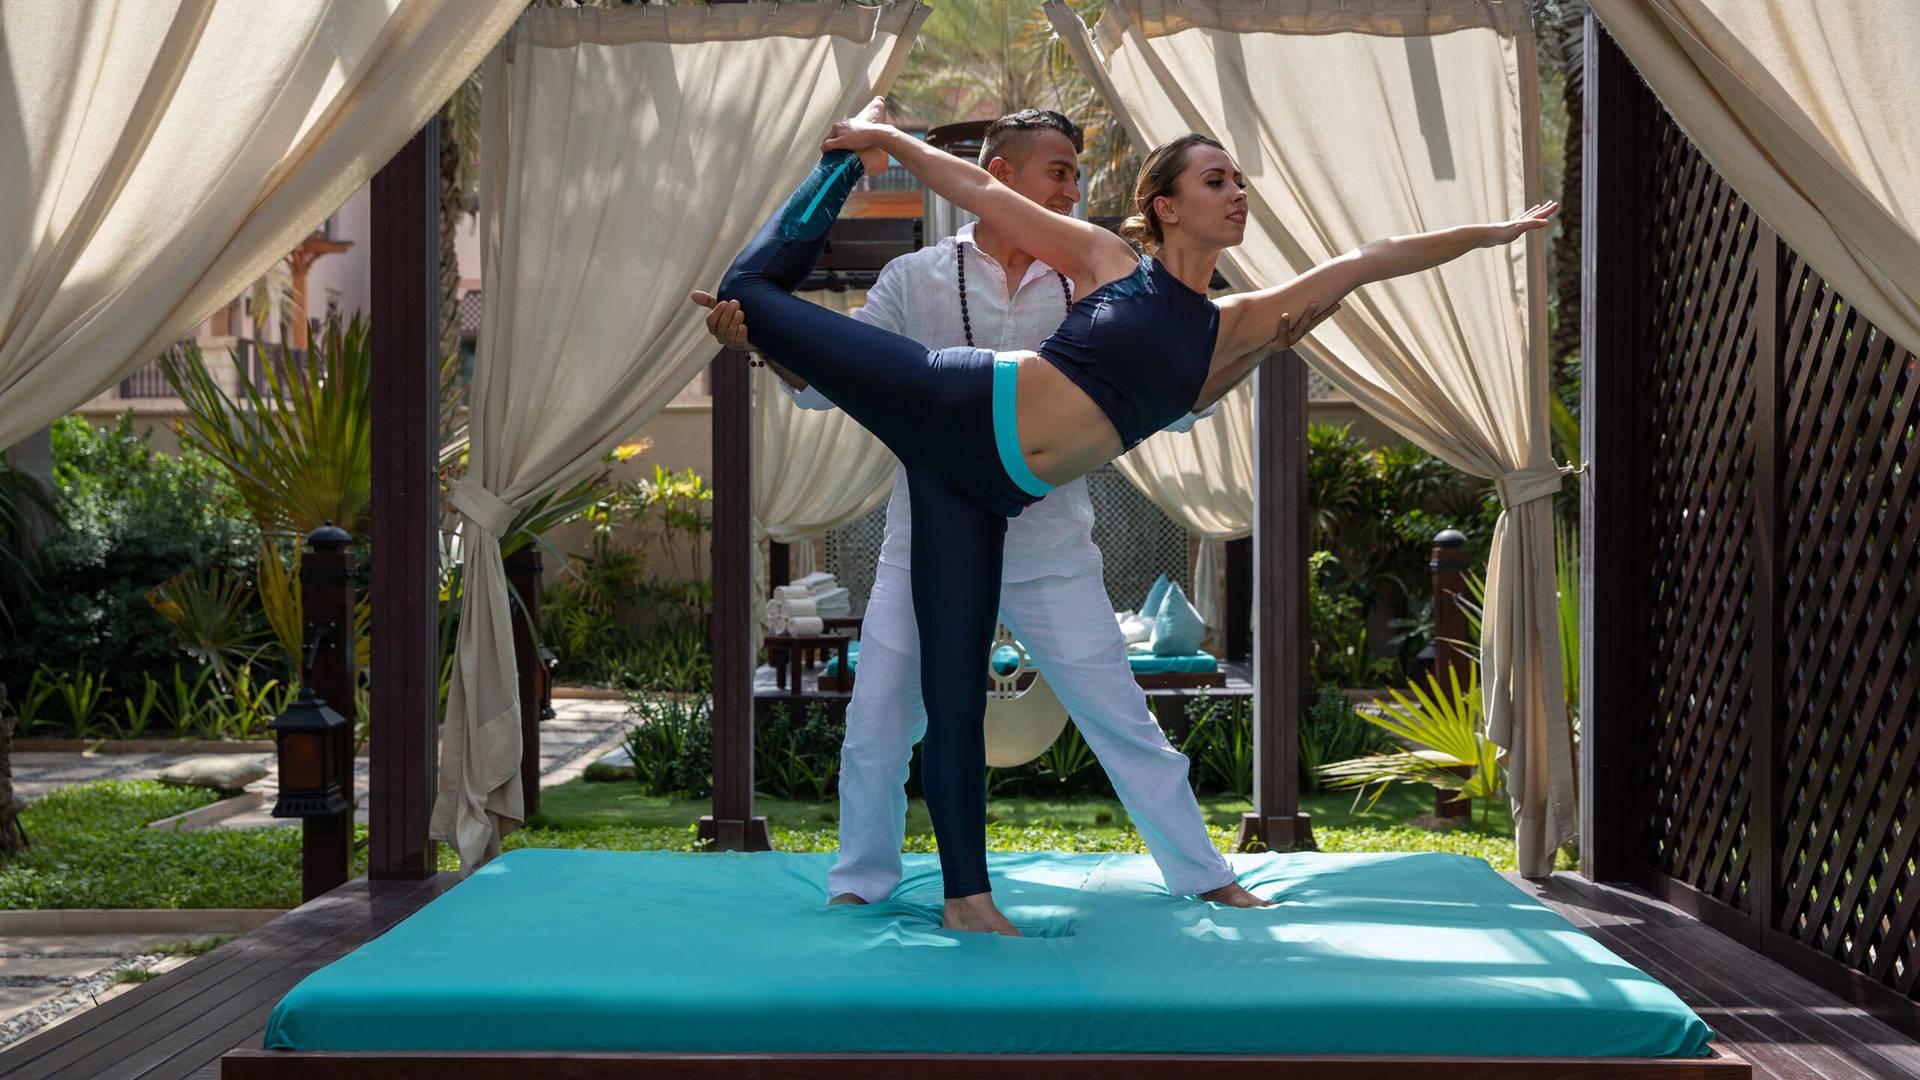 Expert yoga teachers